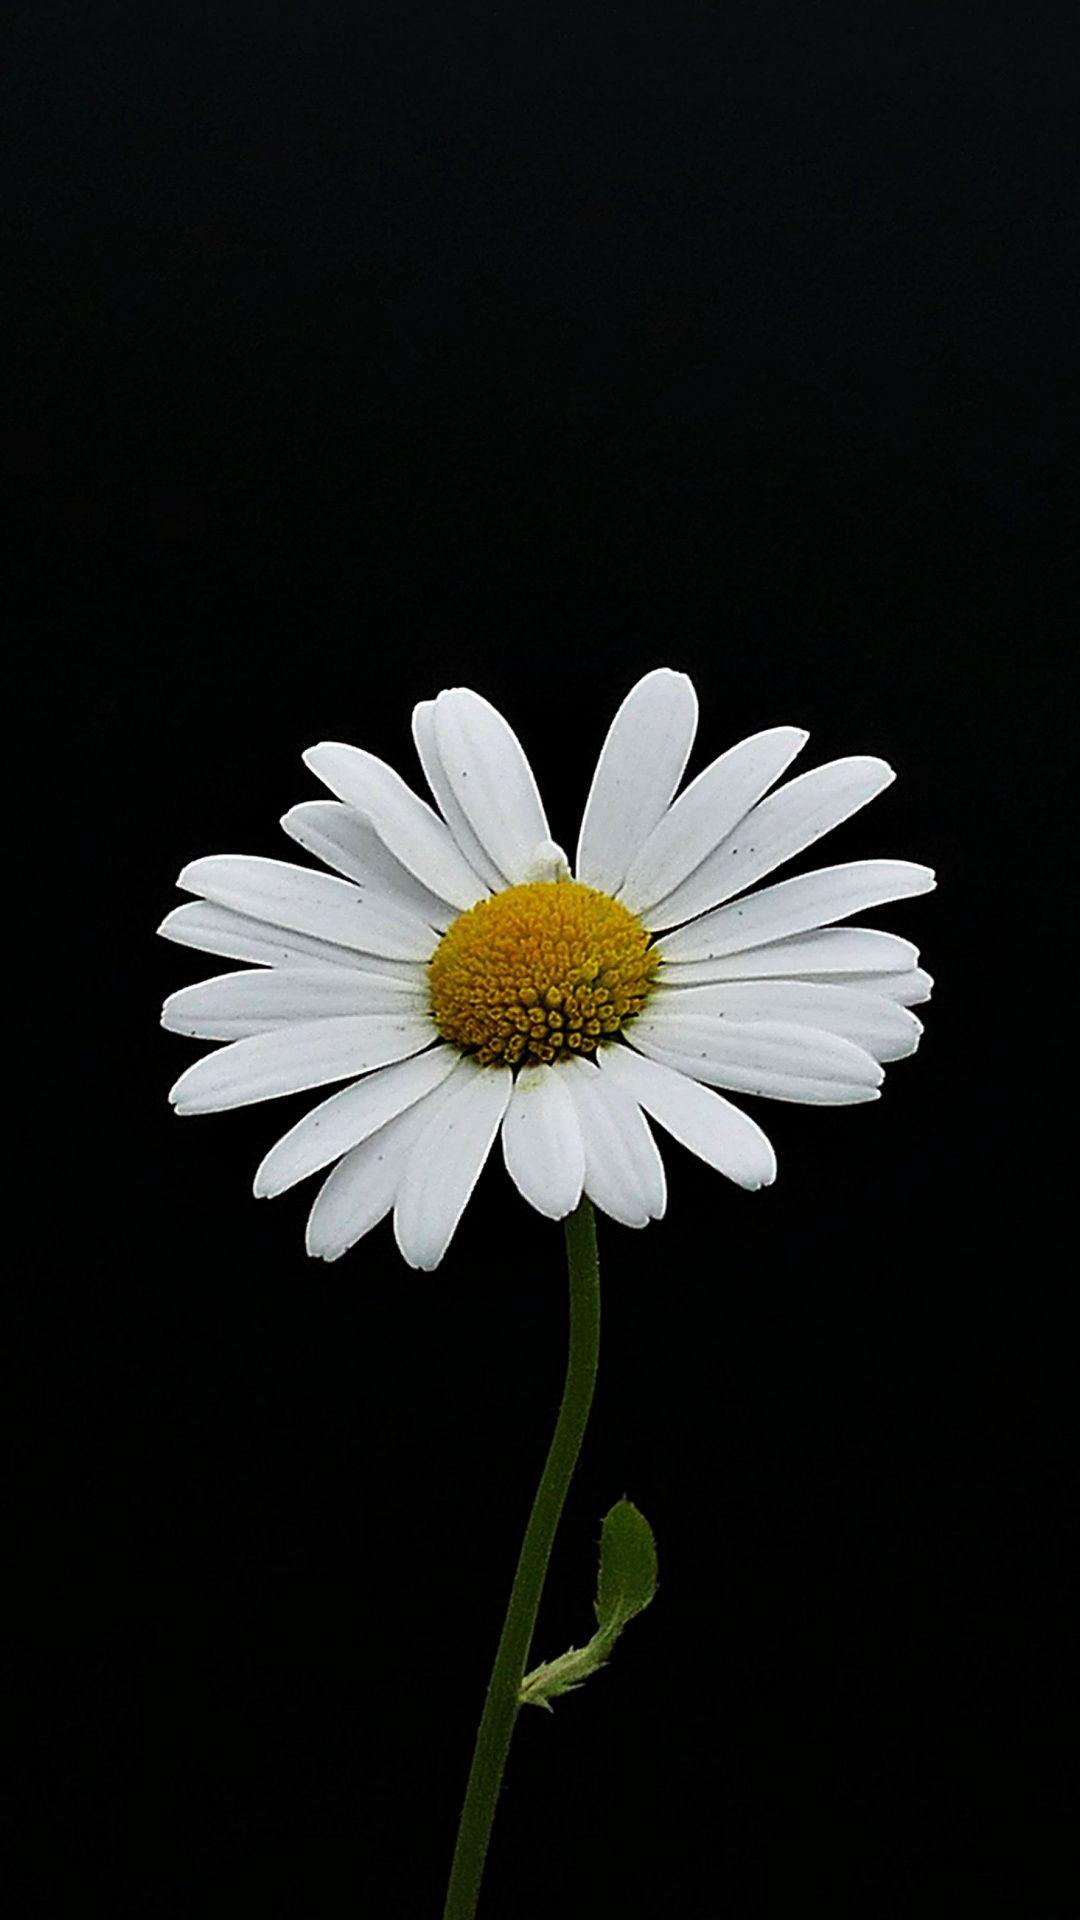 Portrait White Flower Daisy Wallpaper Black And White